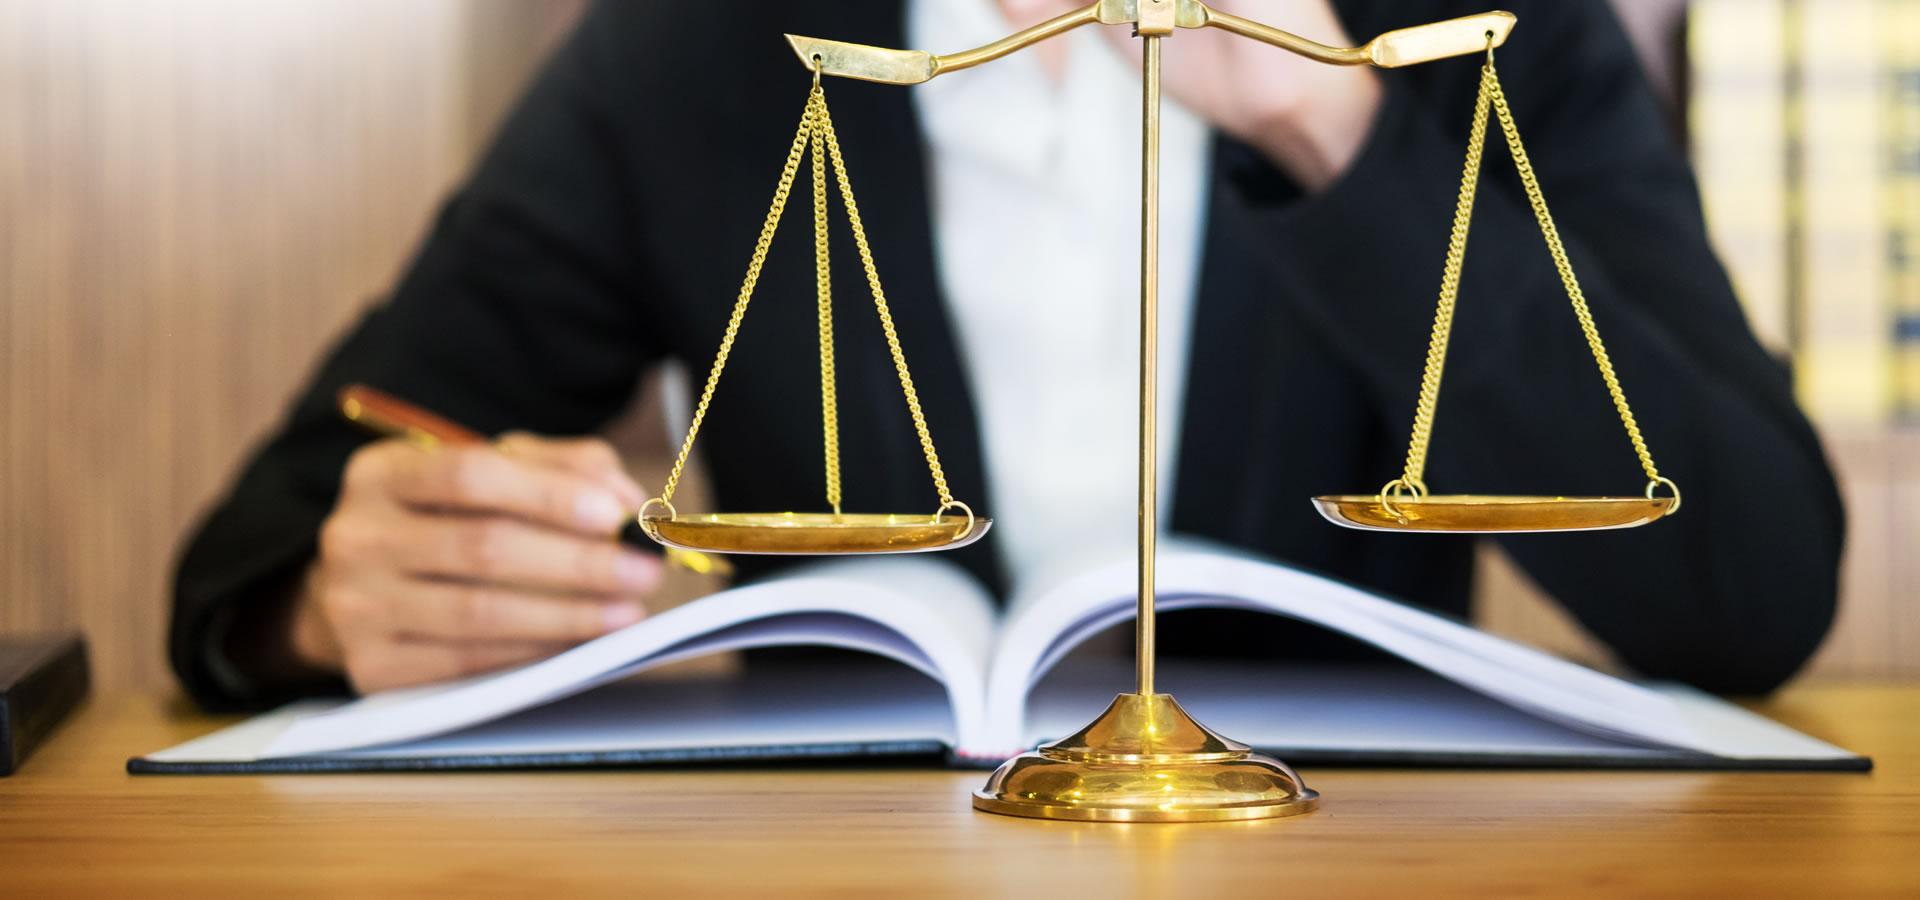 Adoption Attorney in Florida